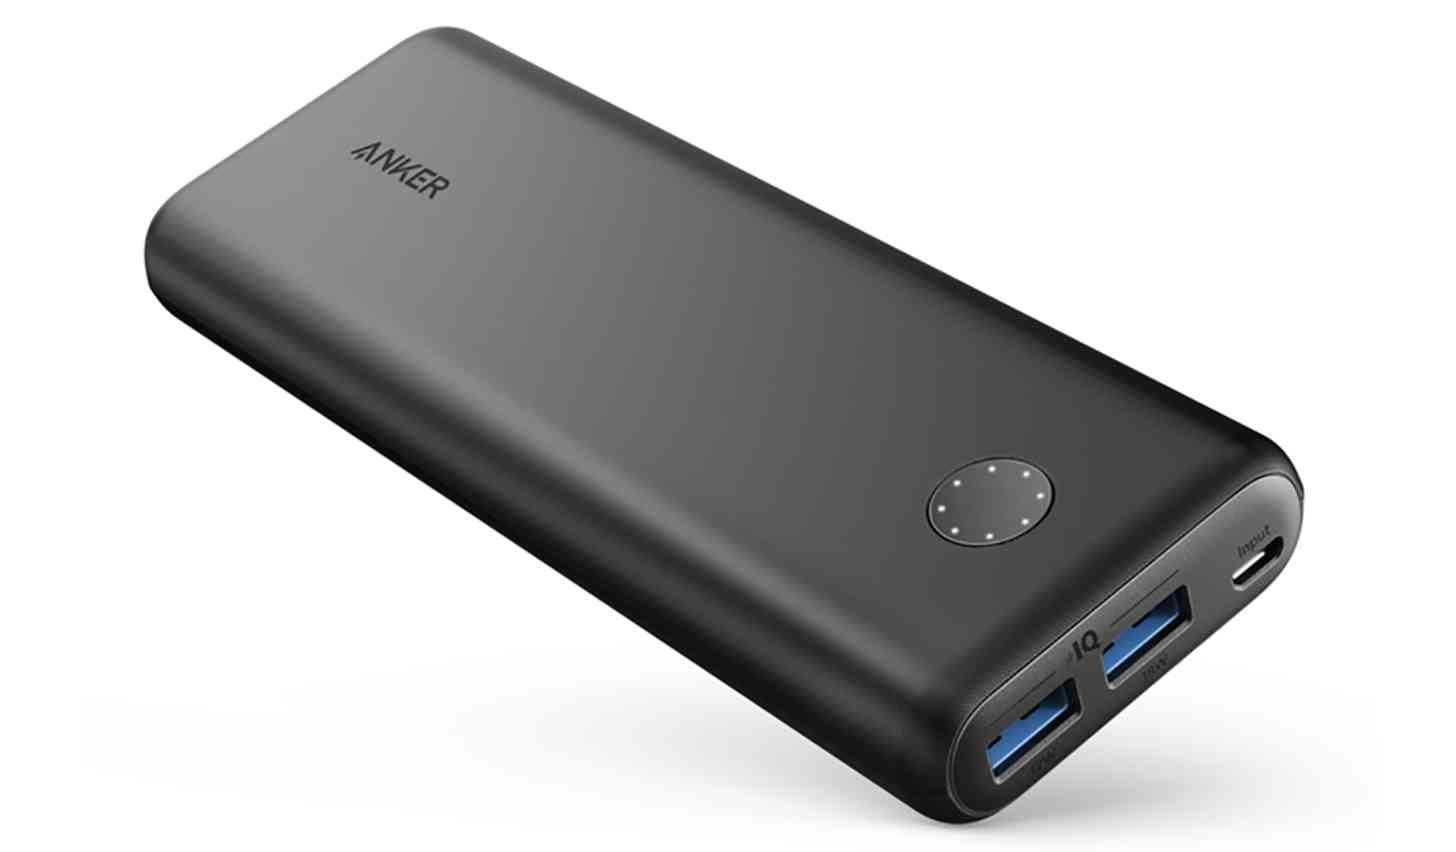 Anker PowerCore II battery pack